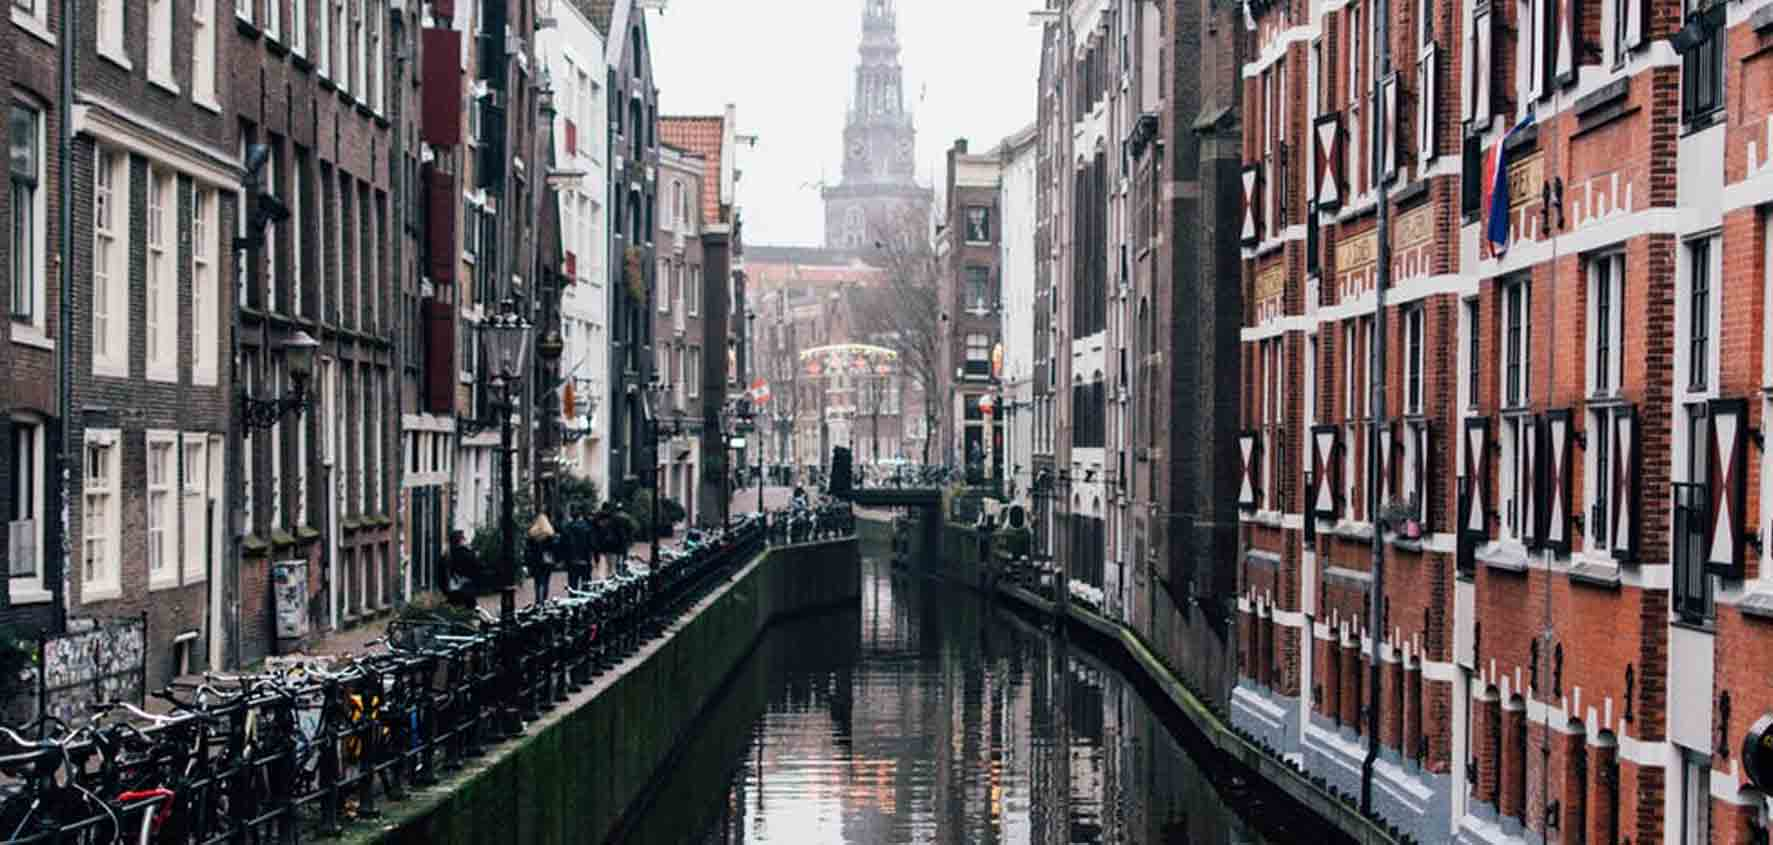 Munchies Niederlande